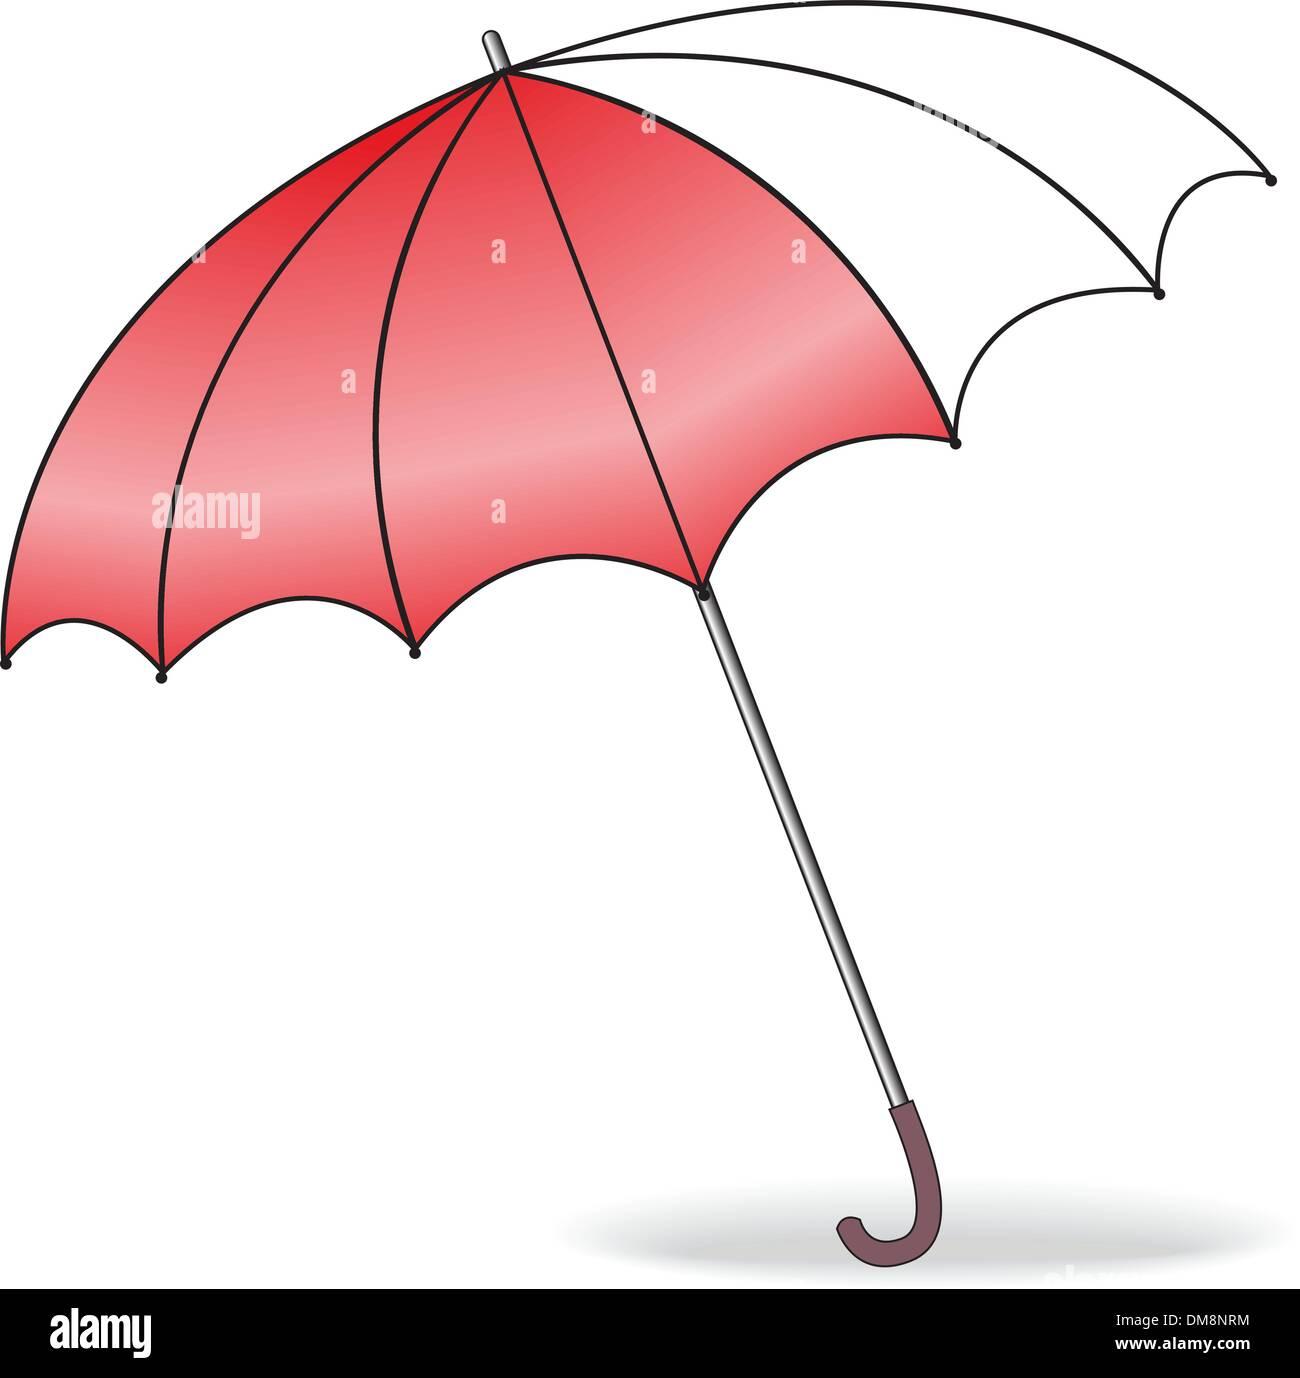 red umbrella - Stock Image